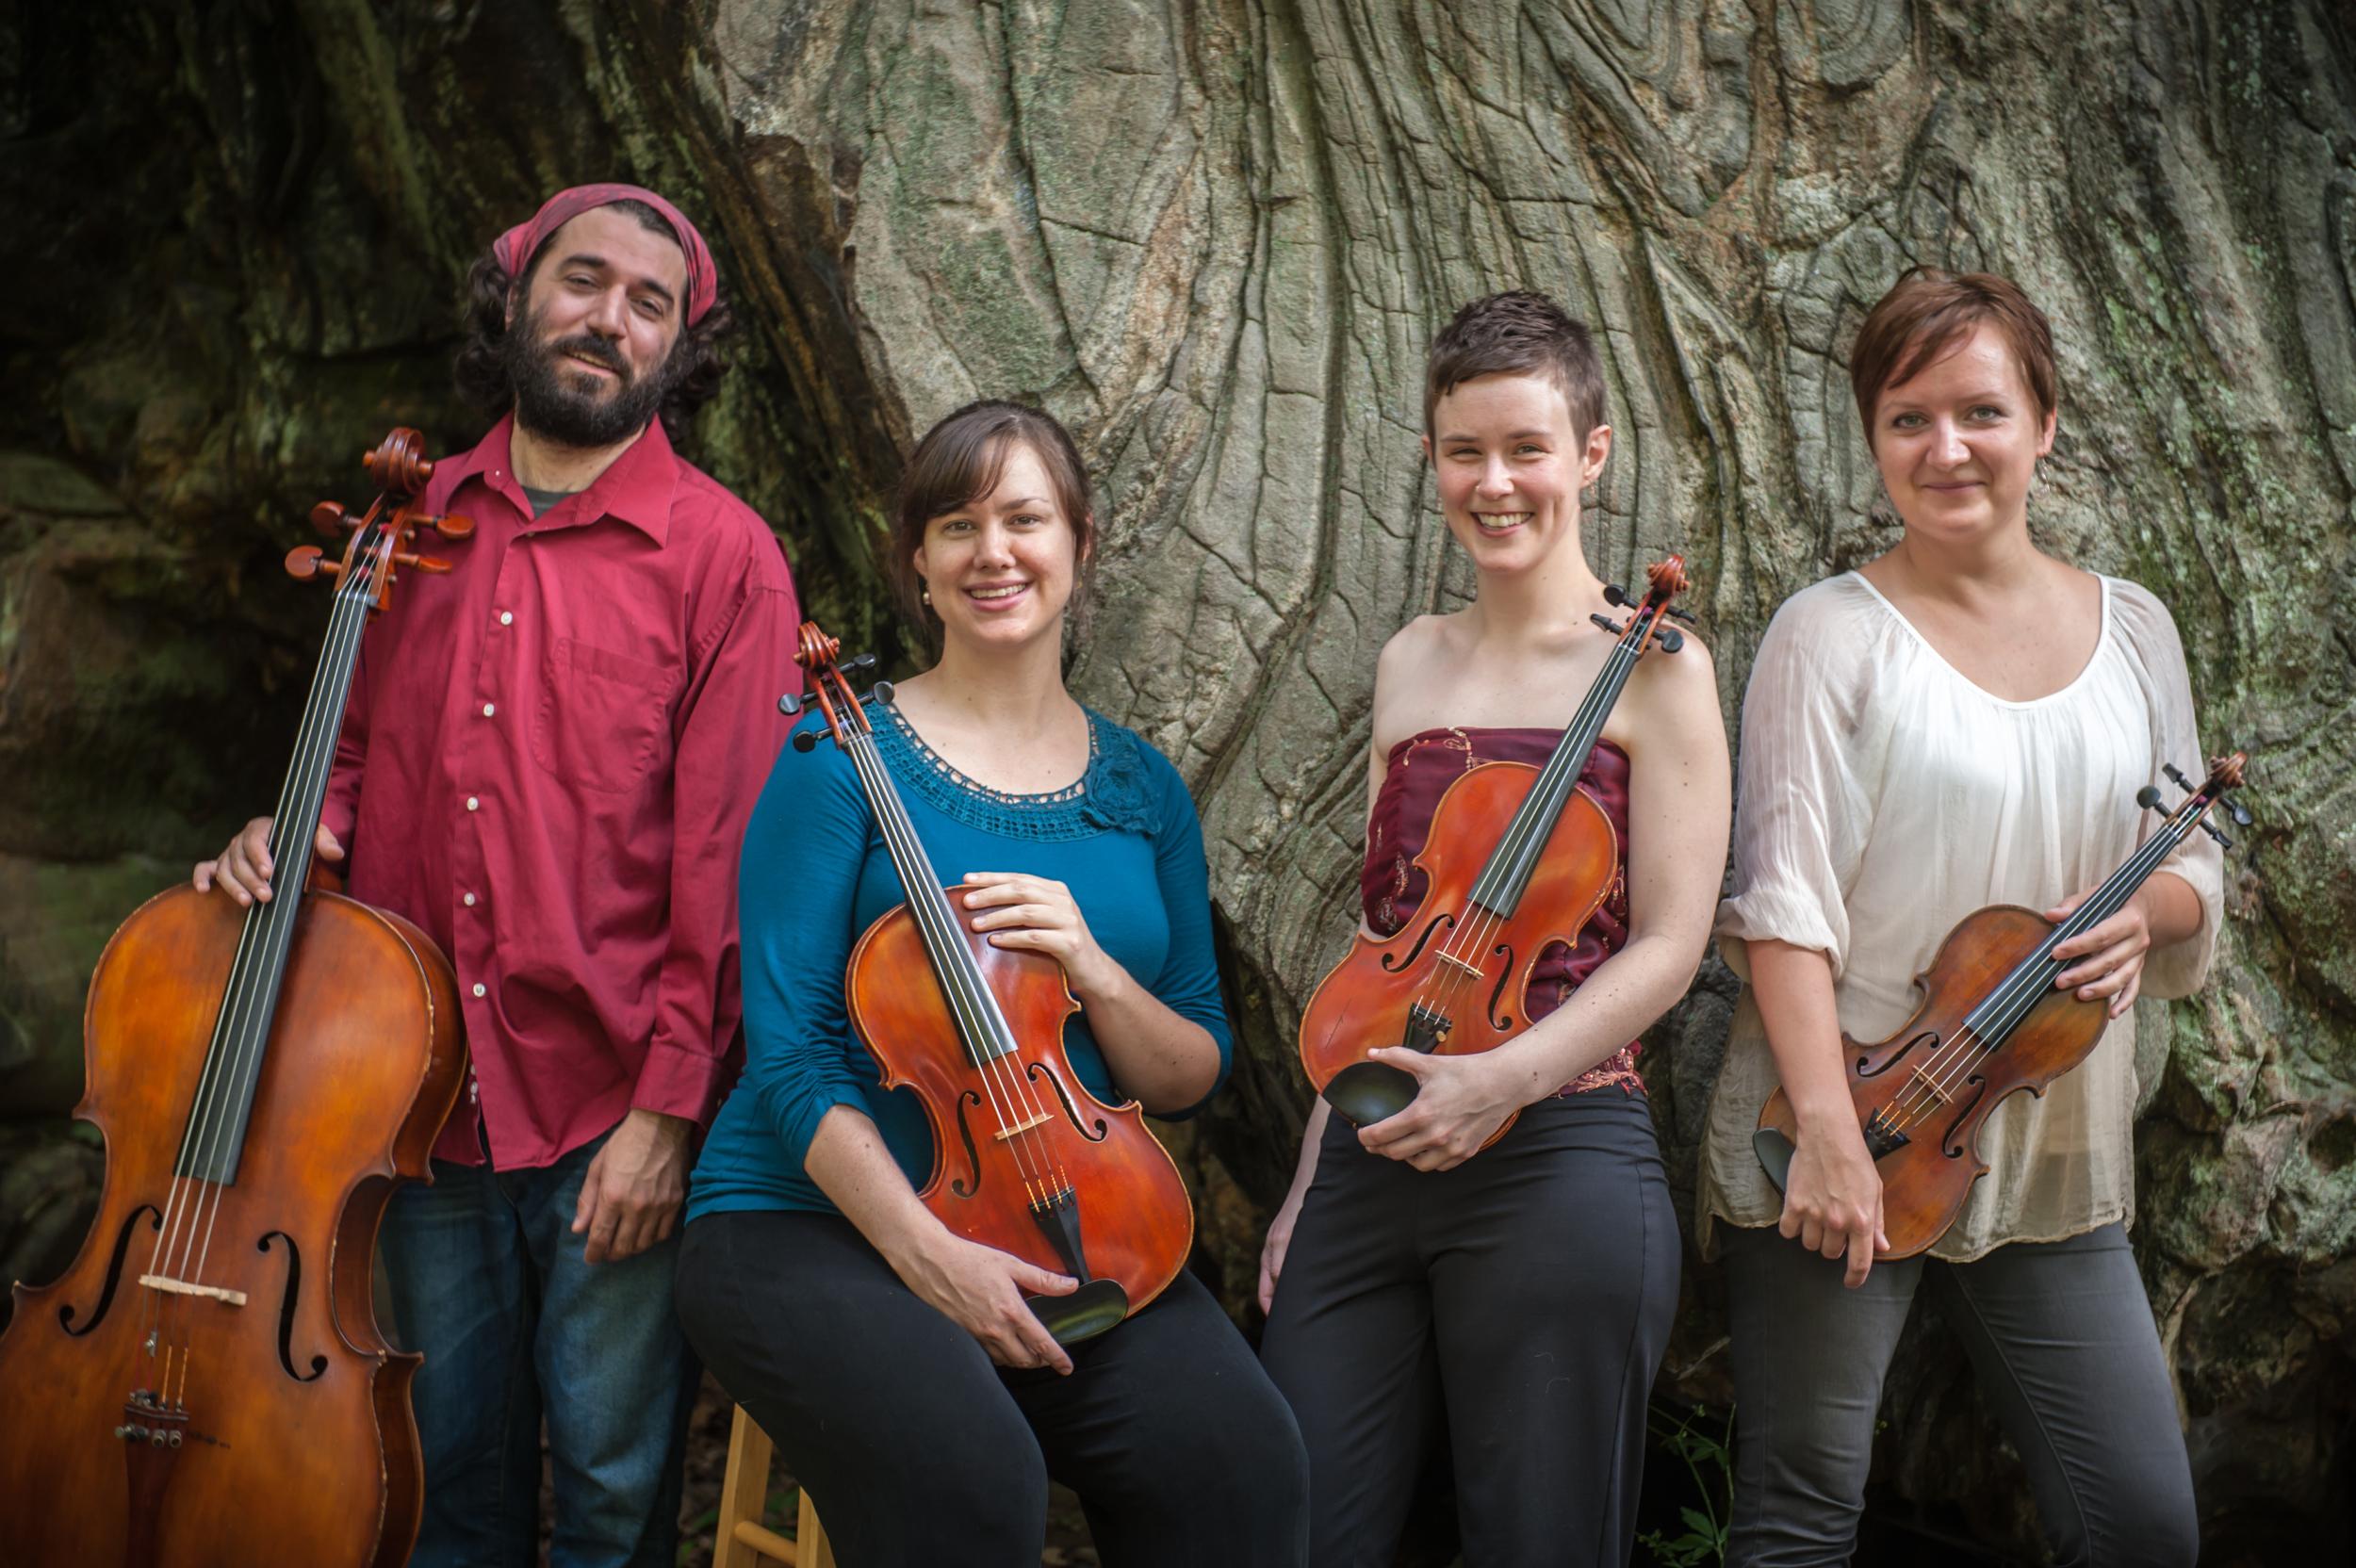 The Opal String Quartet:Franklin Keel-cello, Kara Poorbaugh-viola,Ginger Kowal-violin,Mariya Potapova-violin.